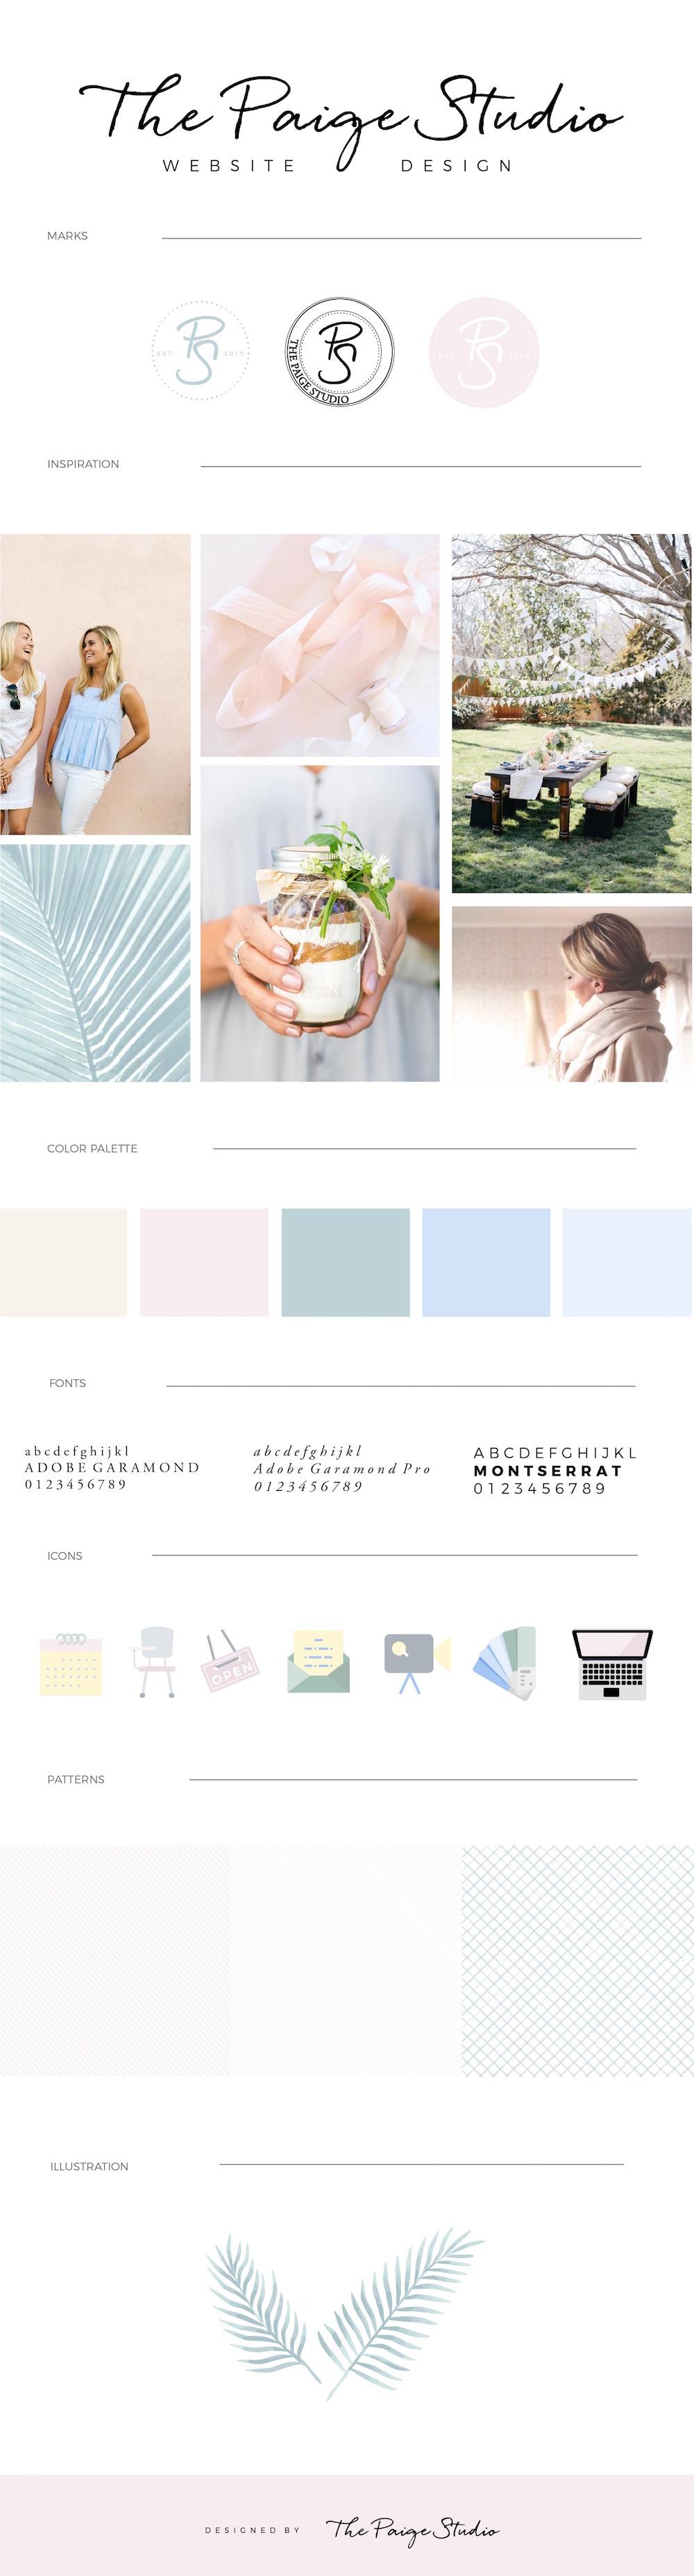 mood and brand board for a female-run website design studio